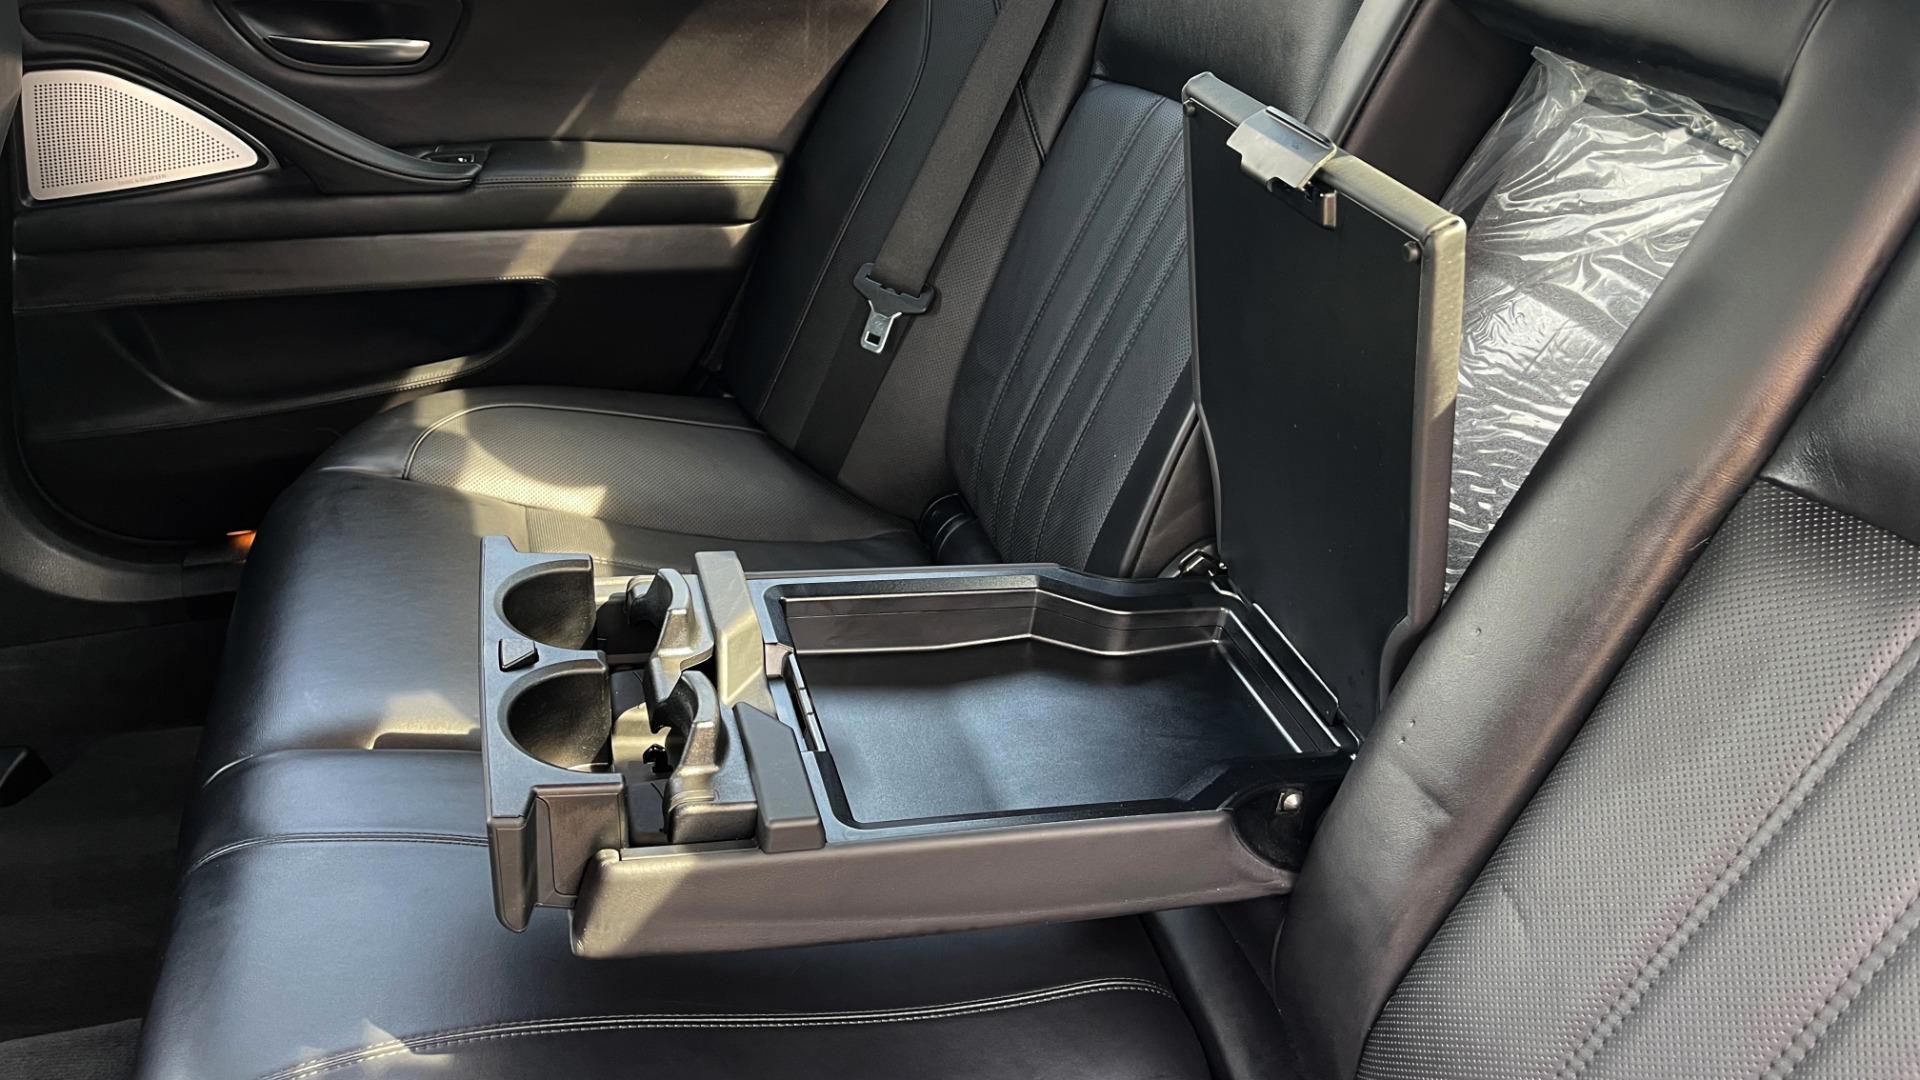 Used 2015 BMW M5 SEDAN / EXEC PKG / HUD / NAV / B&O SND / SUNROOF / REARVIEW for sale Sold at Formula Imports in Charlotte NC 28227 79